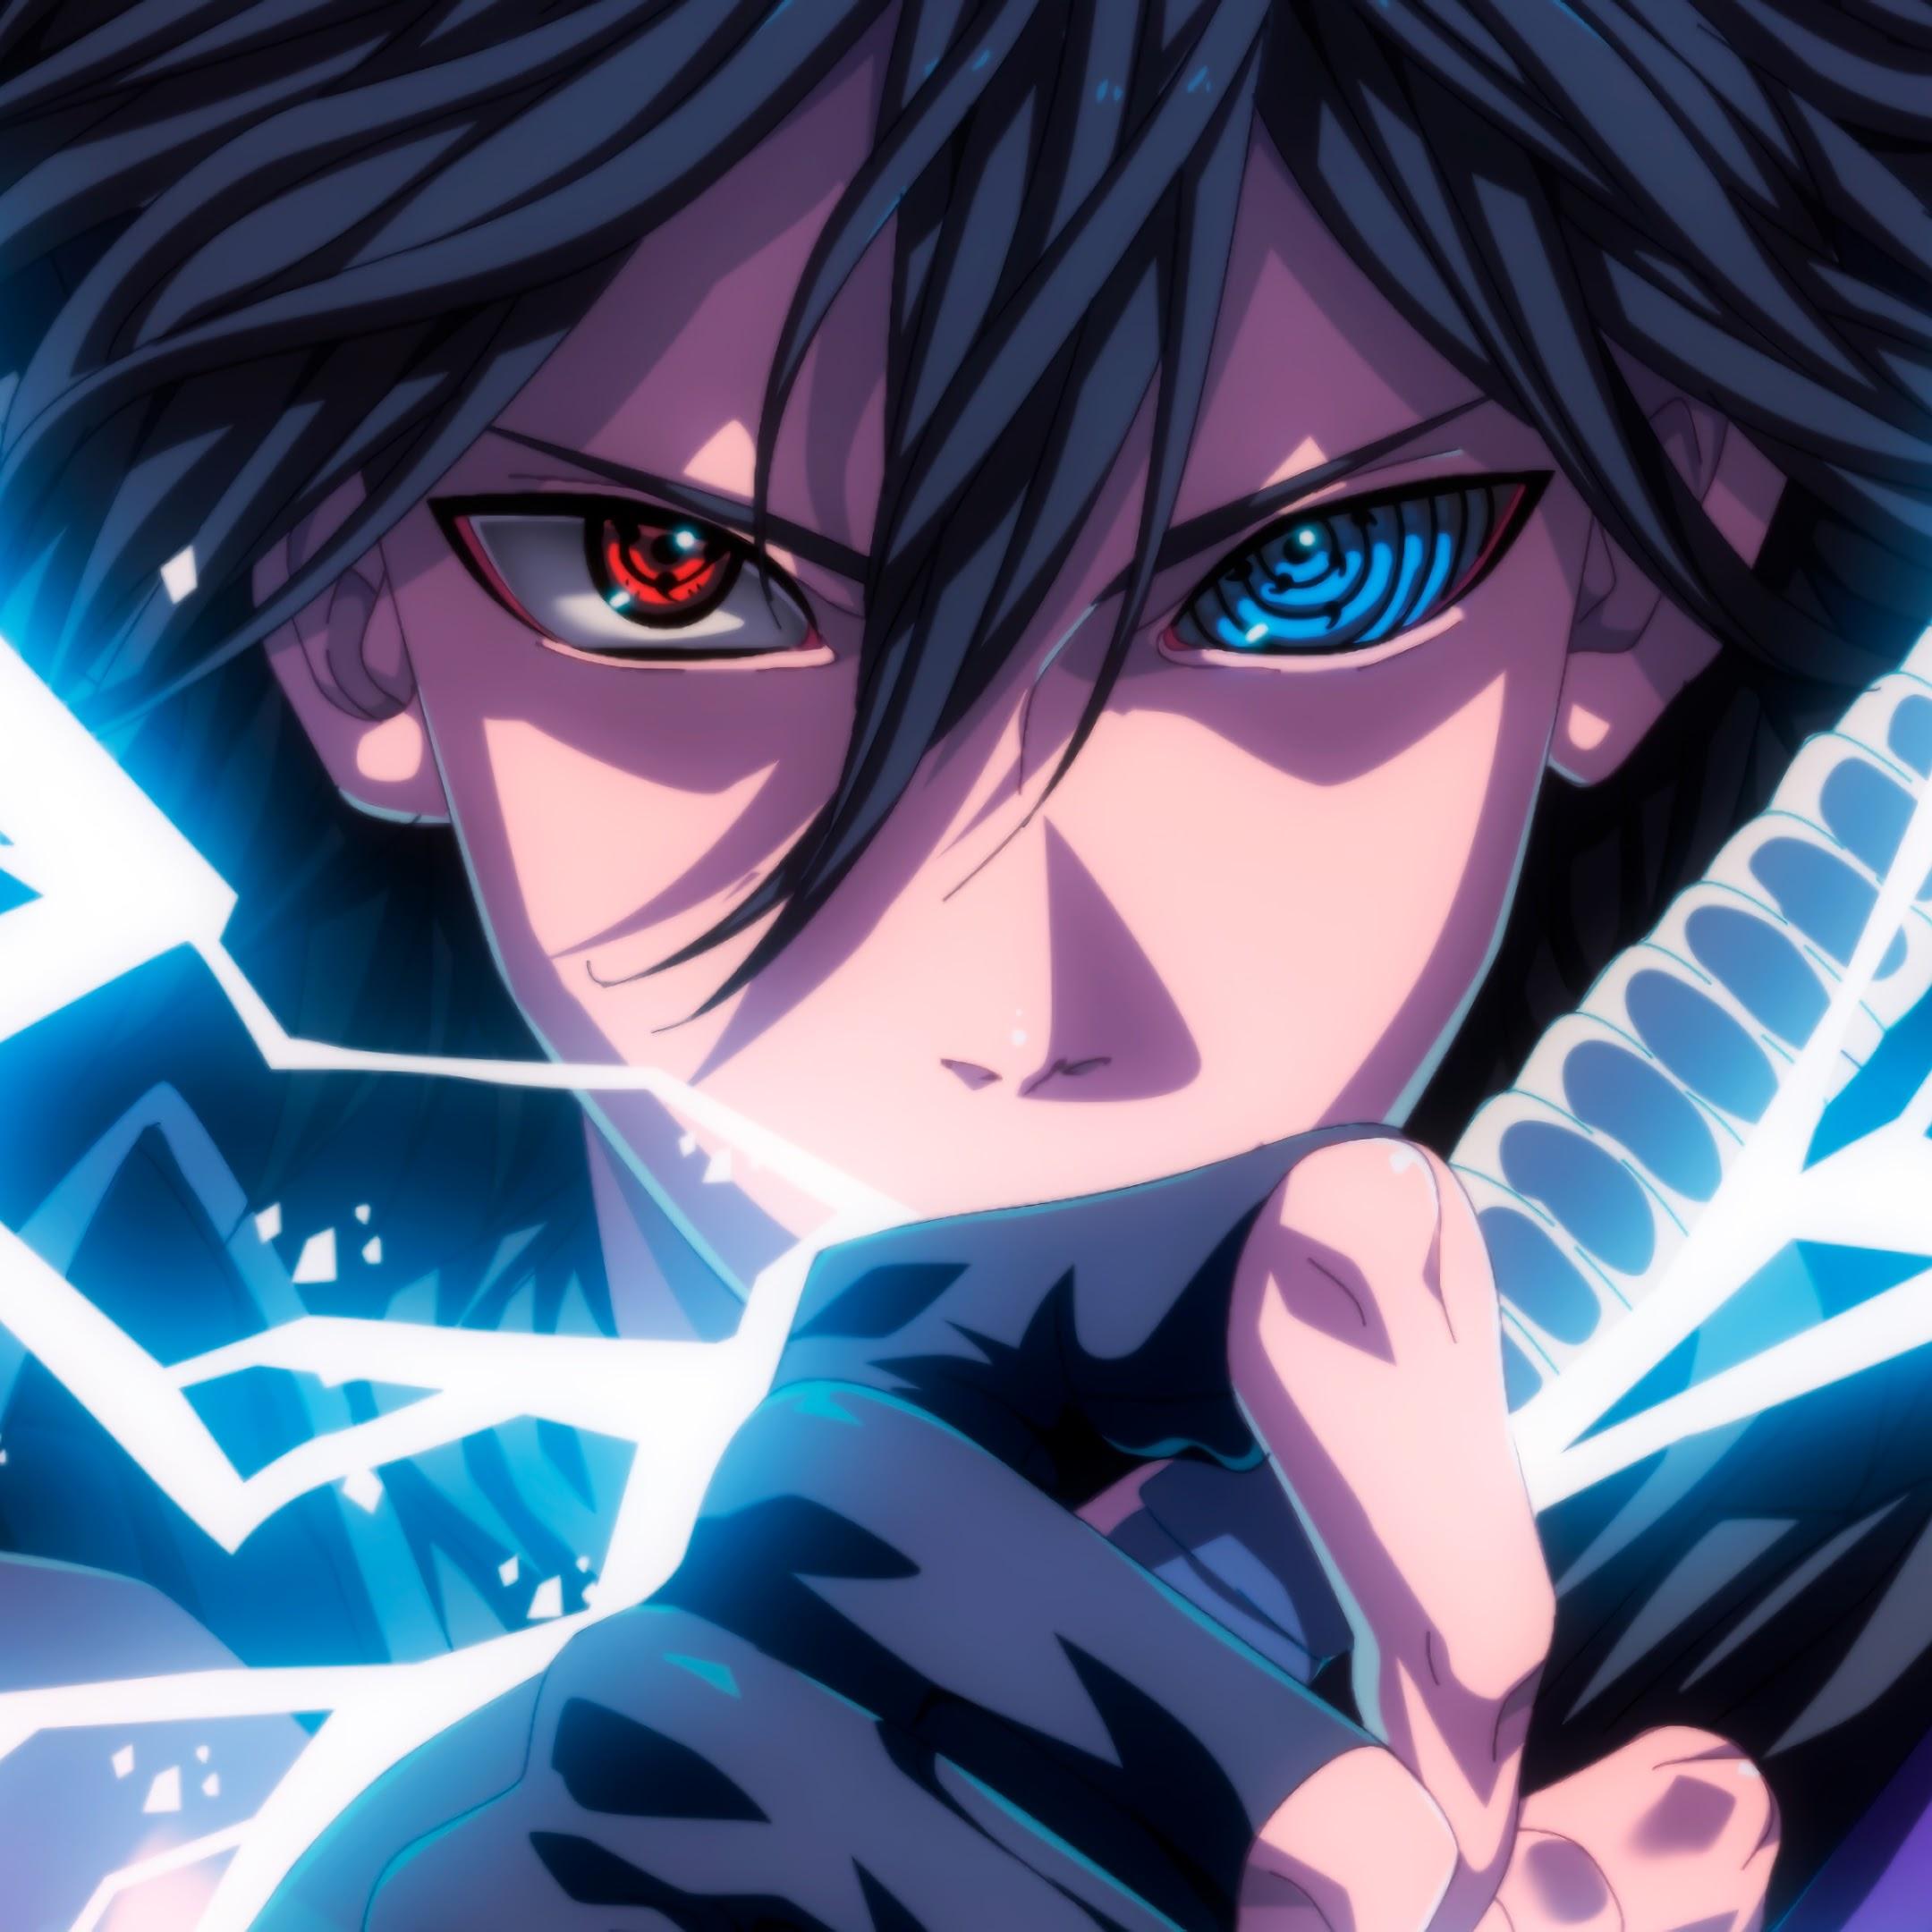 Sasuke, Sharingan, Rinnegan, Eyes, Lightning, 4K, #33